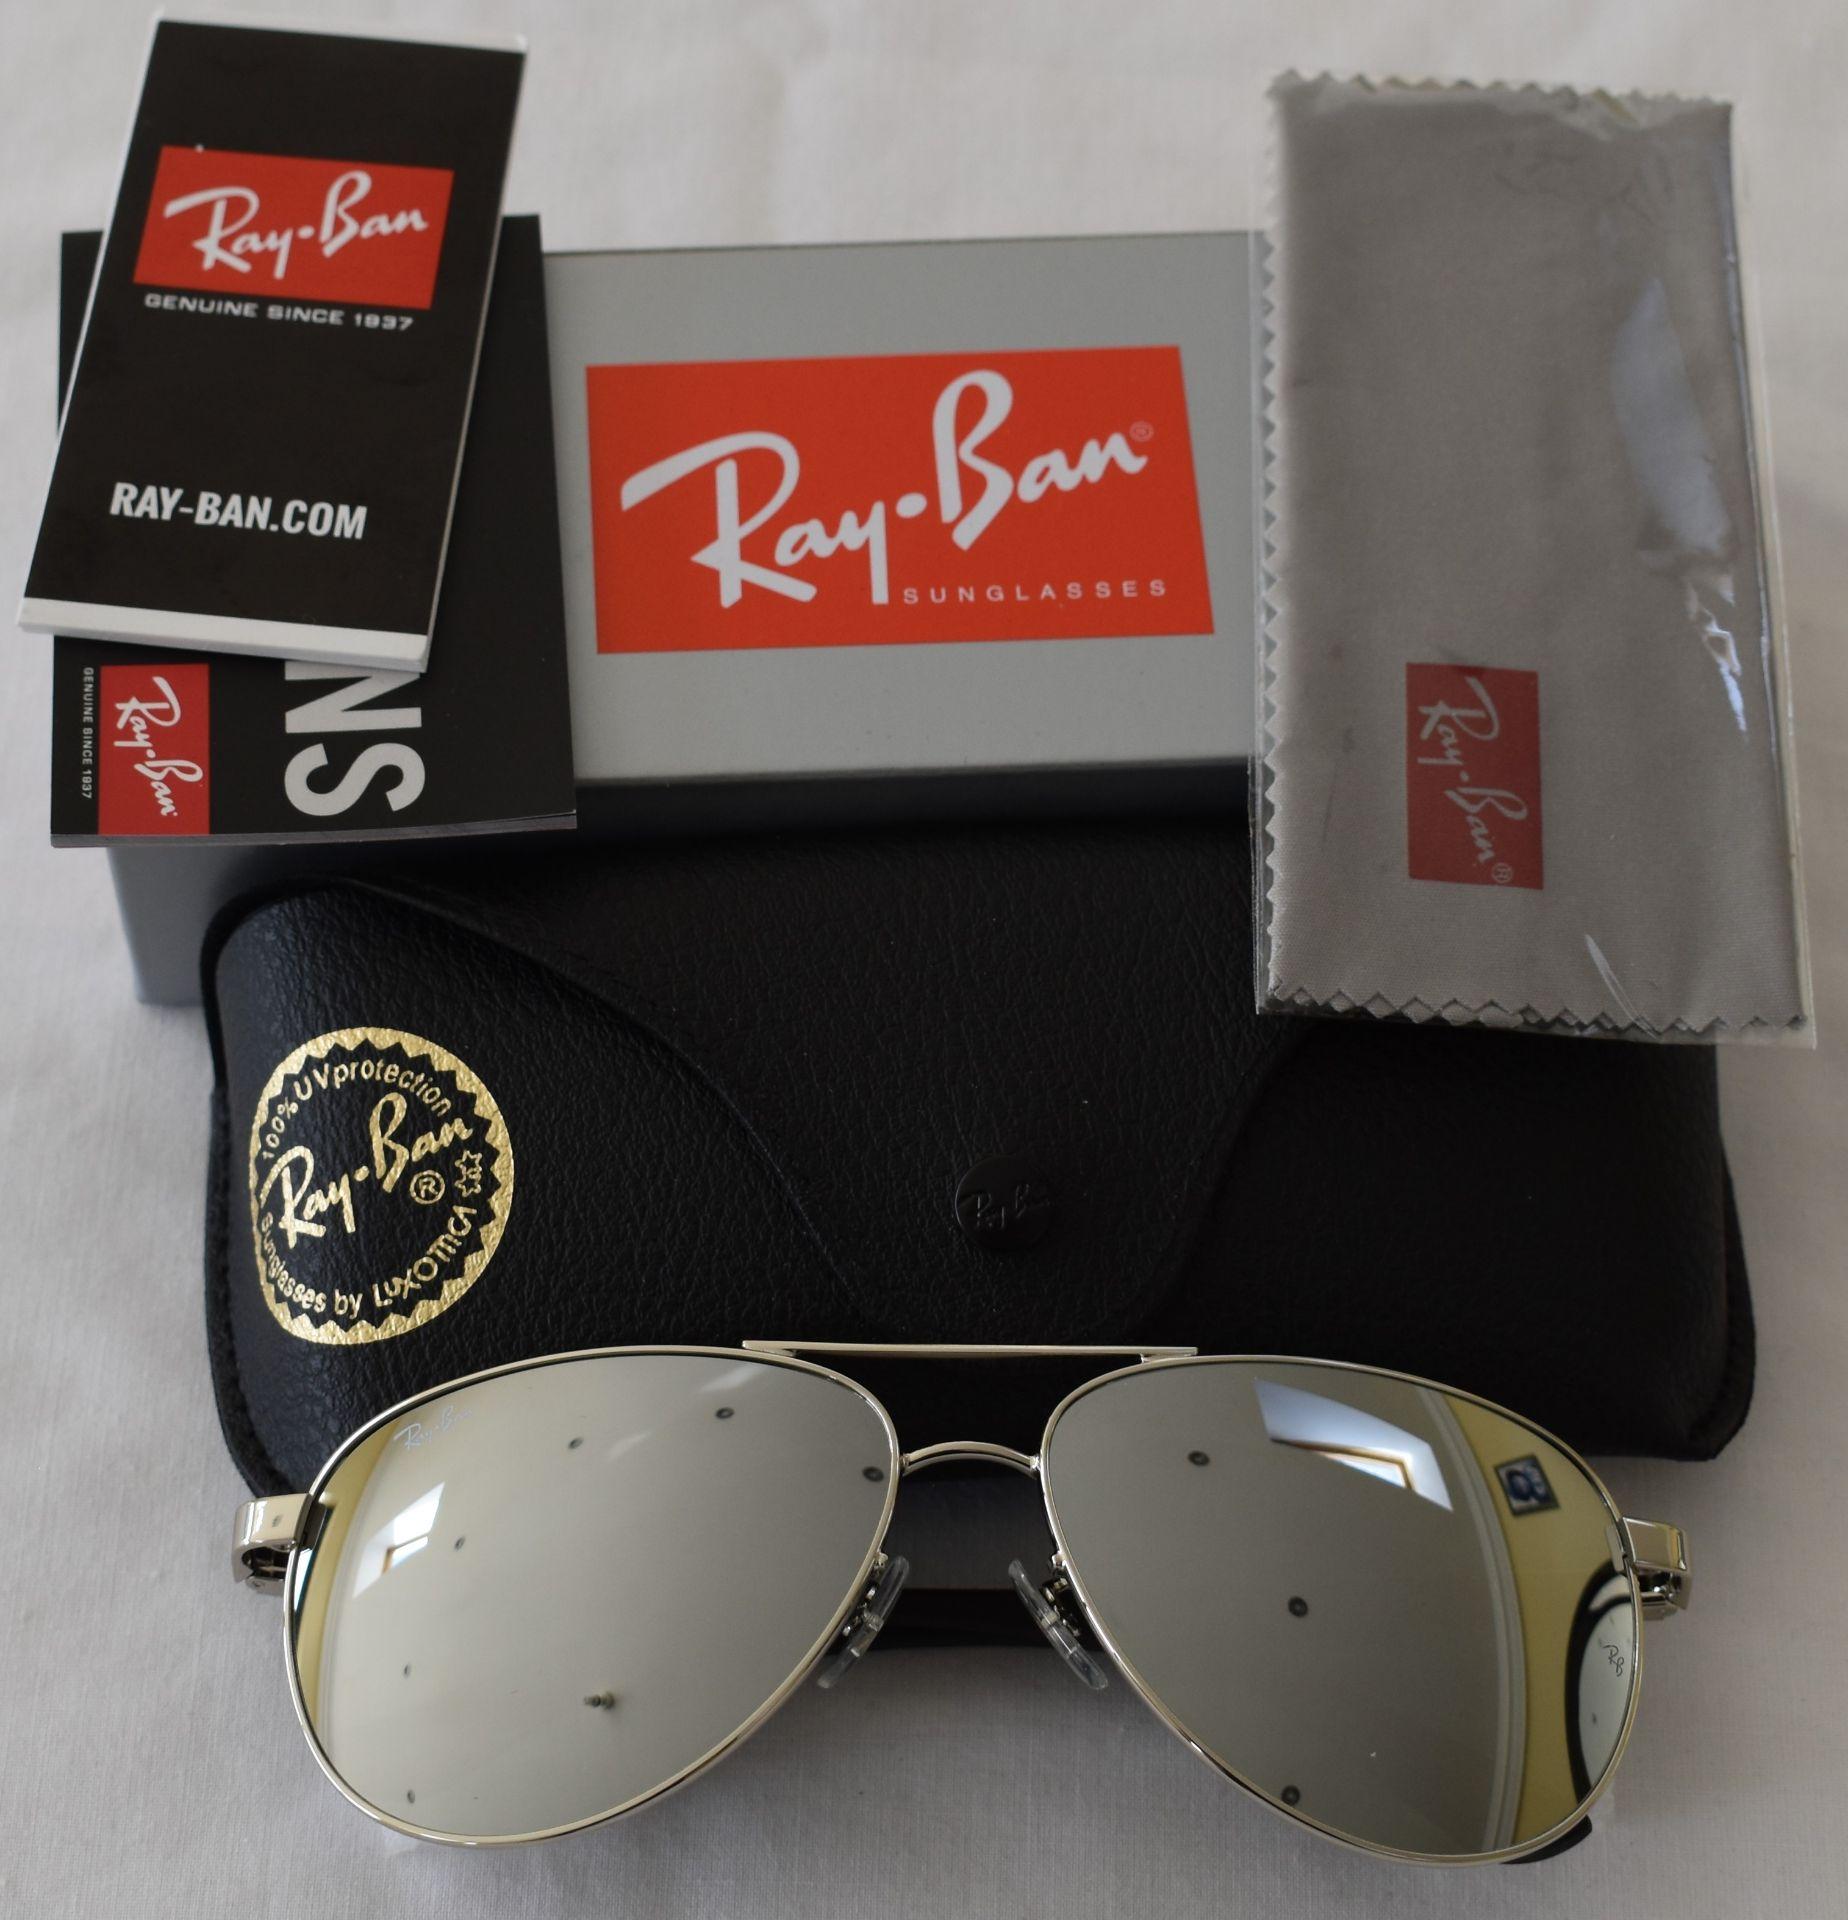 Ray Ban Sunglasses ORB8313 003/40 *2N